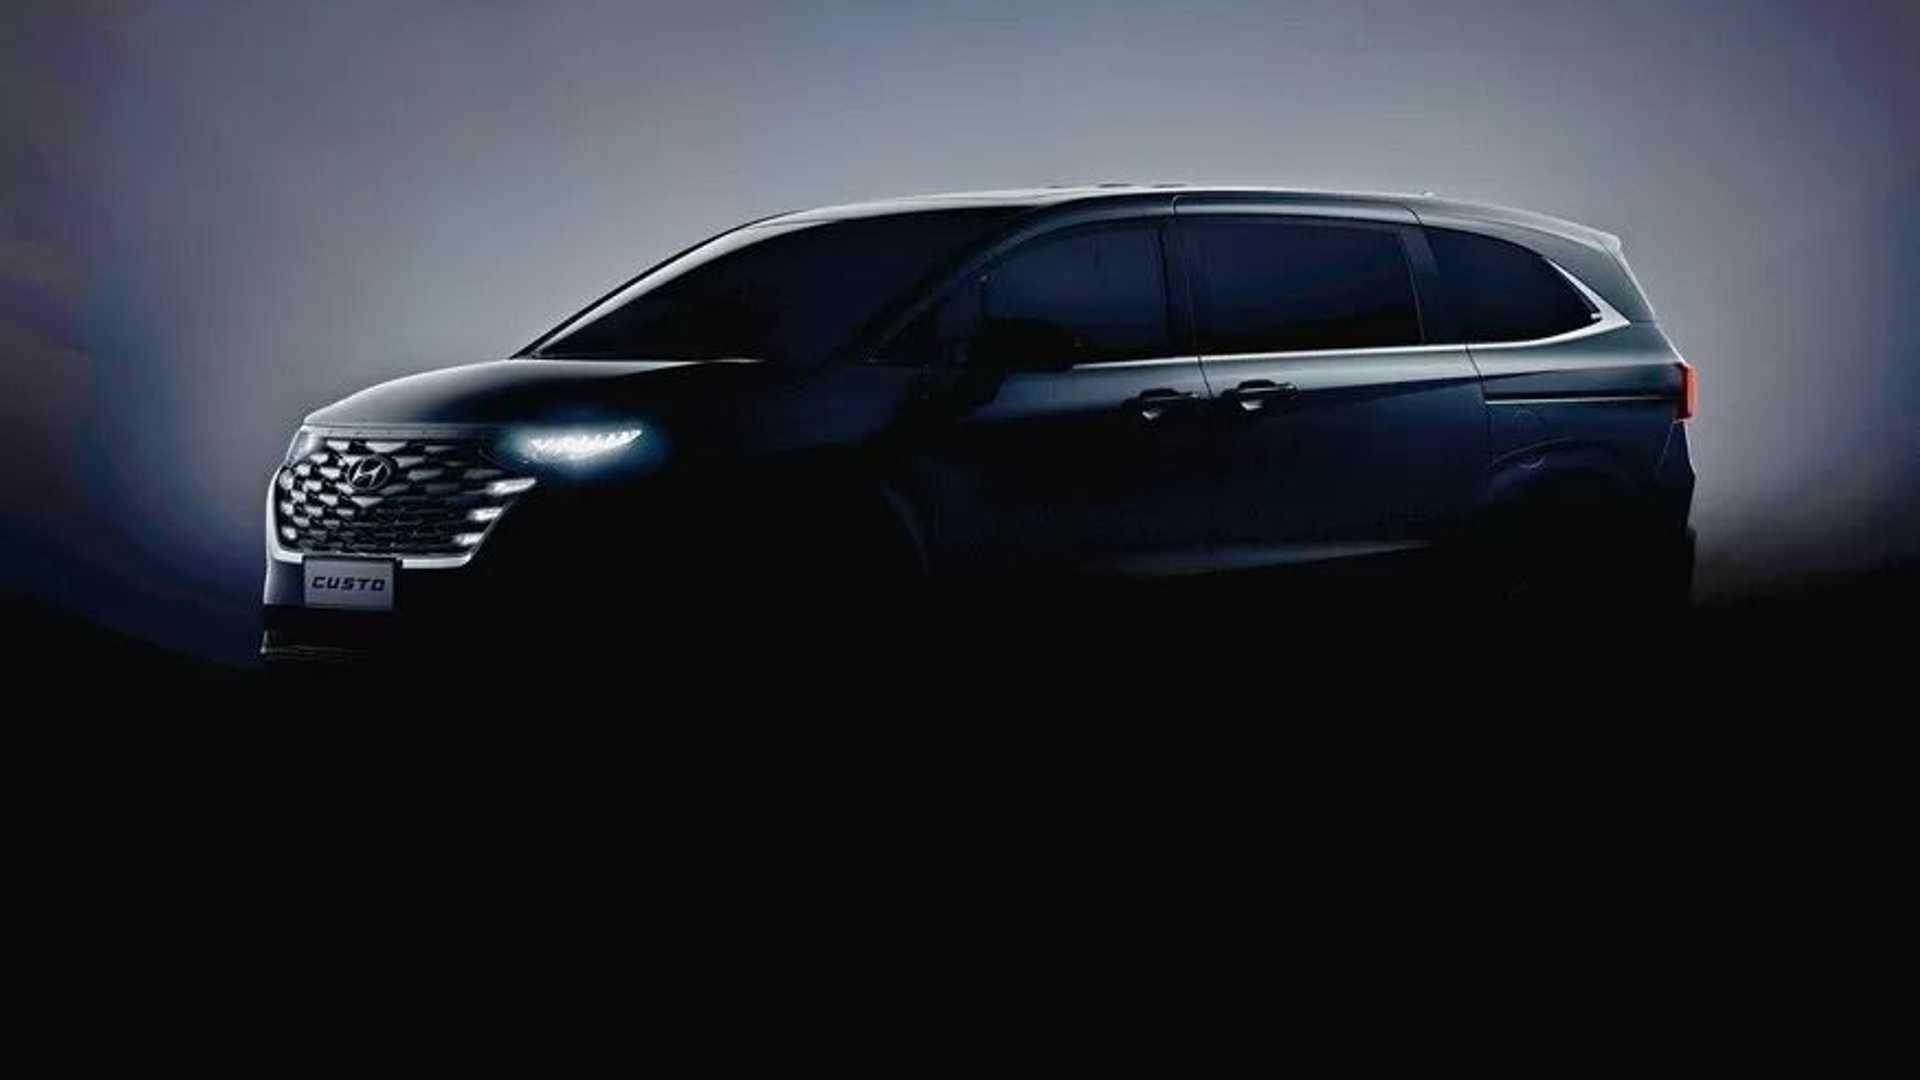 Hyundai-Custo-photos-11